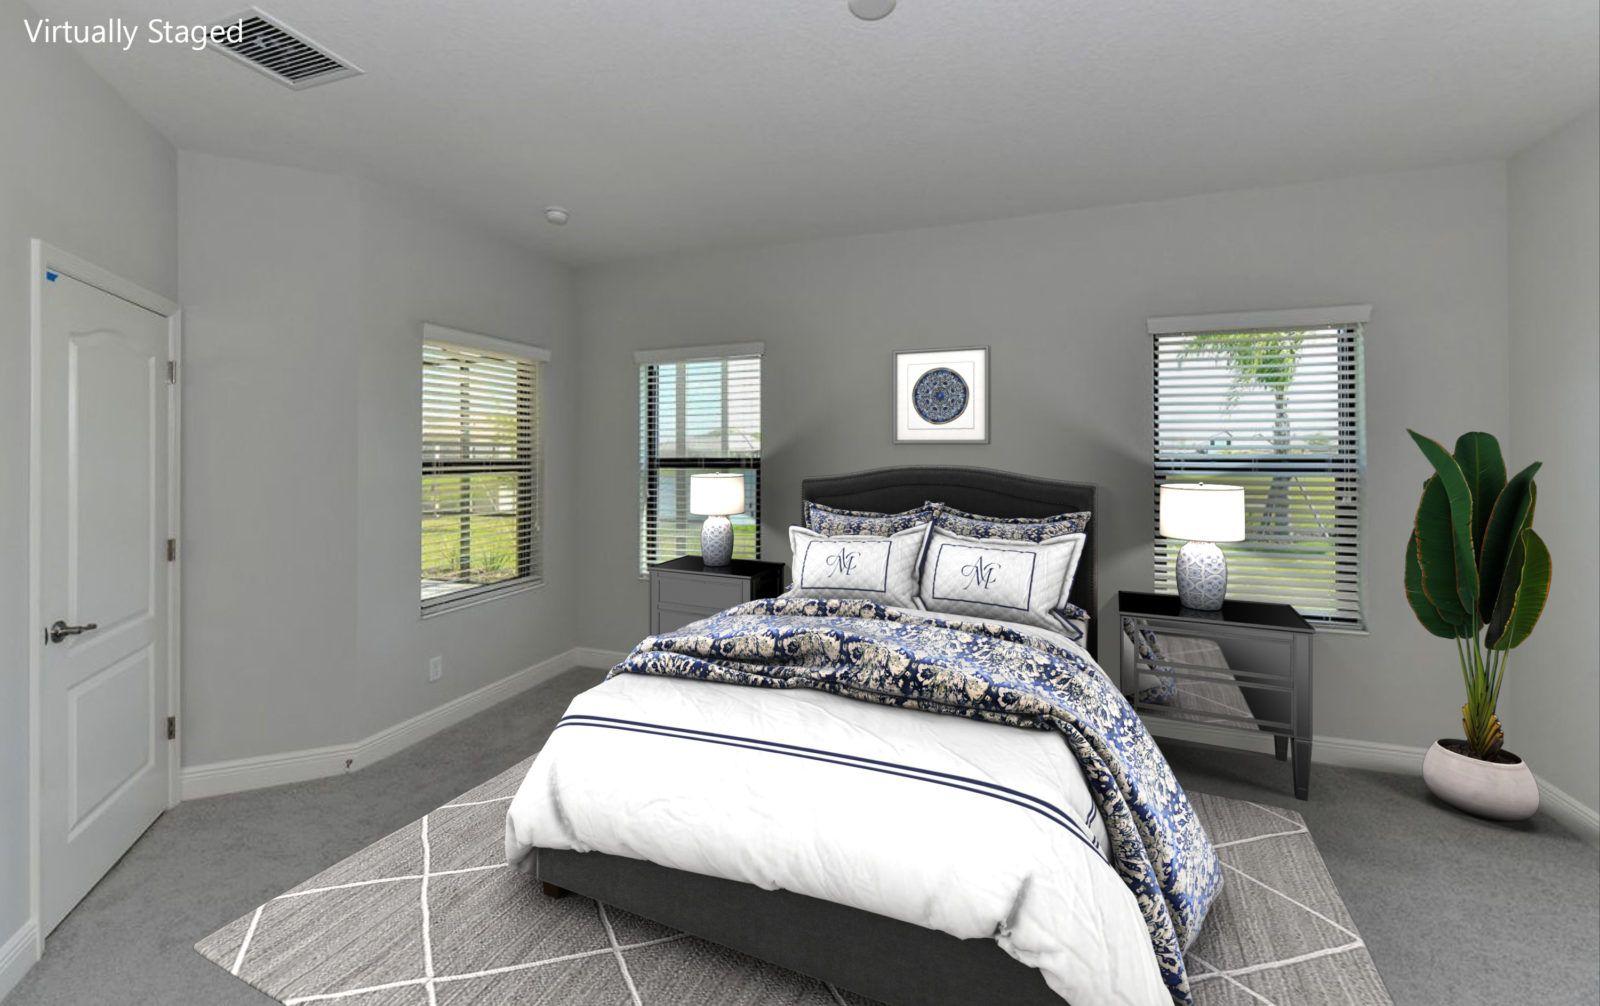 Bedroom featured in the Patriot By Neal Communities in Sarasota-Bradenton, FL